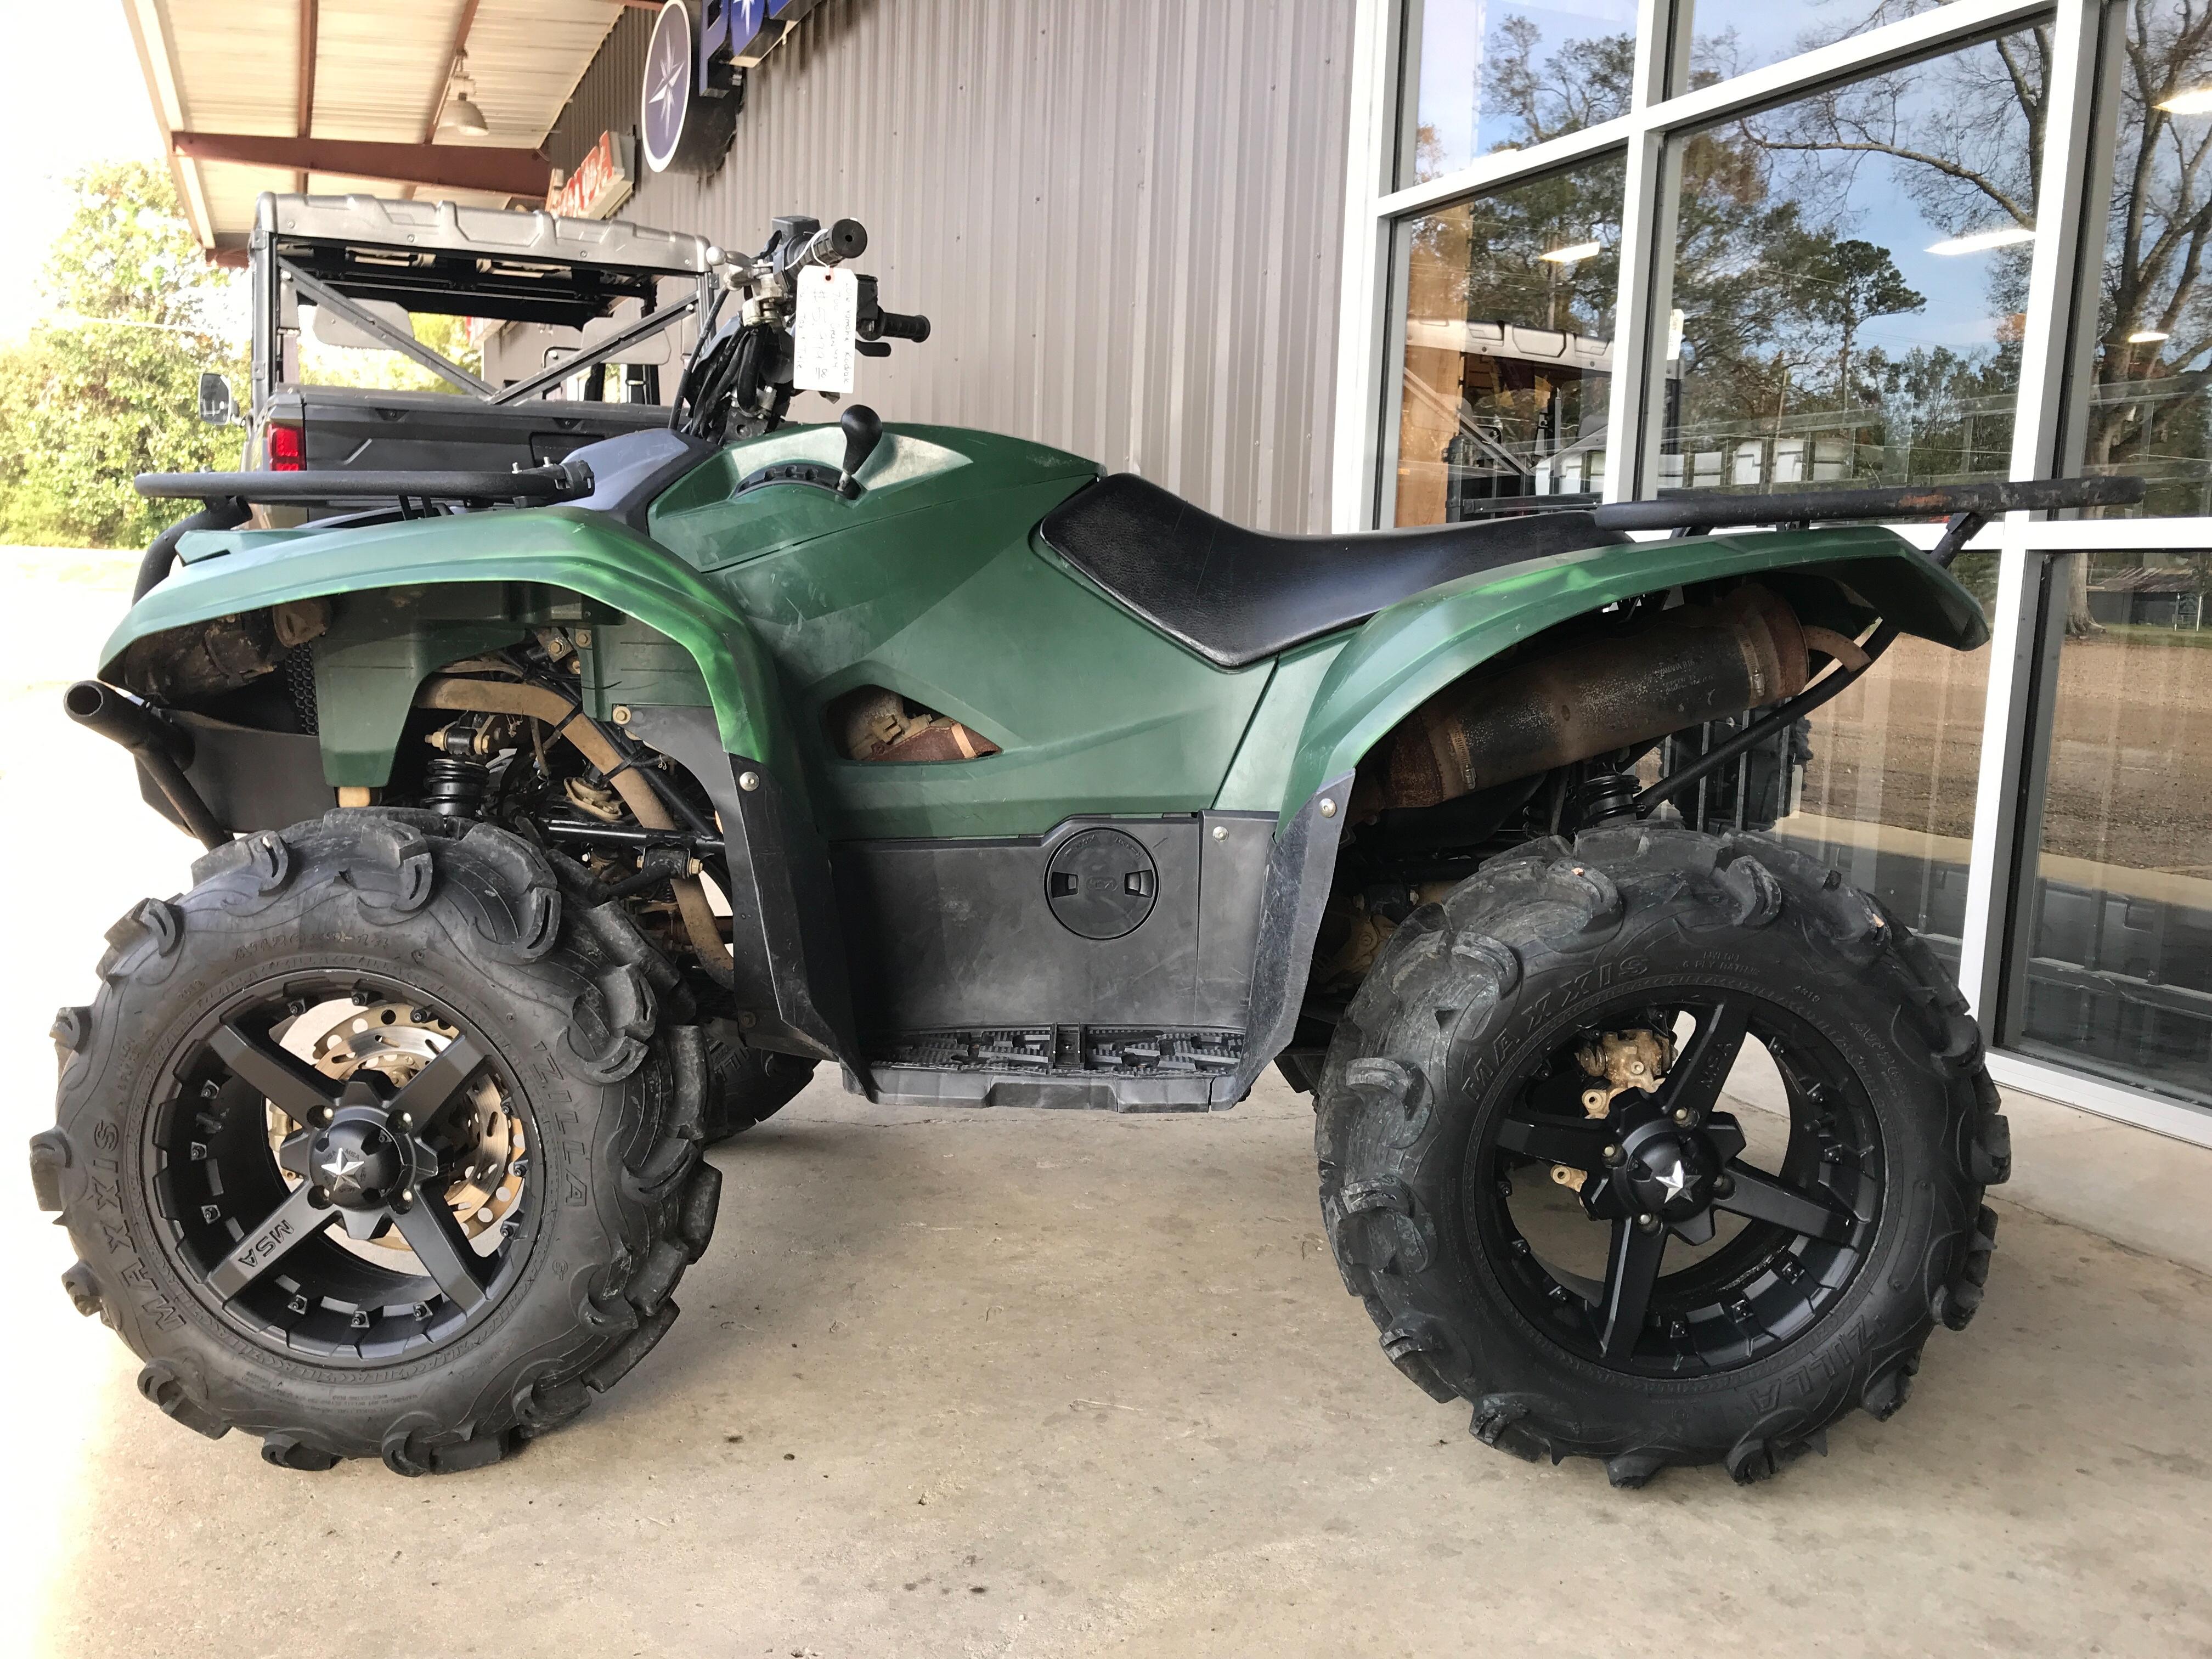 2016 YAMAHA 700 700 at ATV Zone, LLC